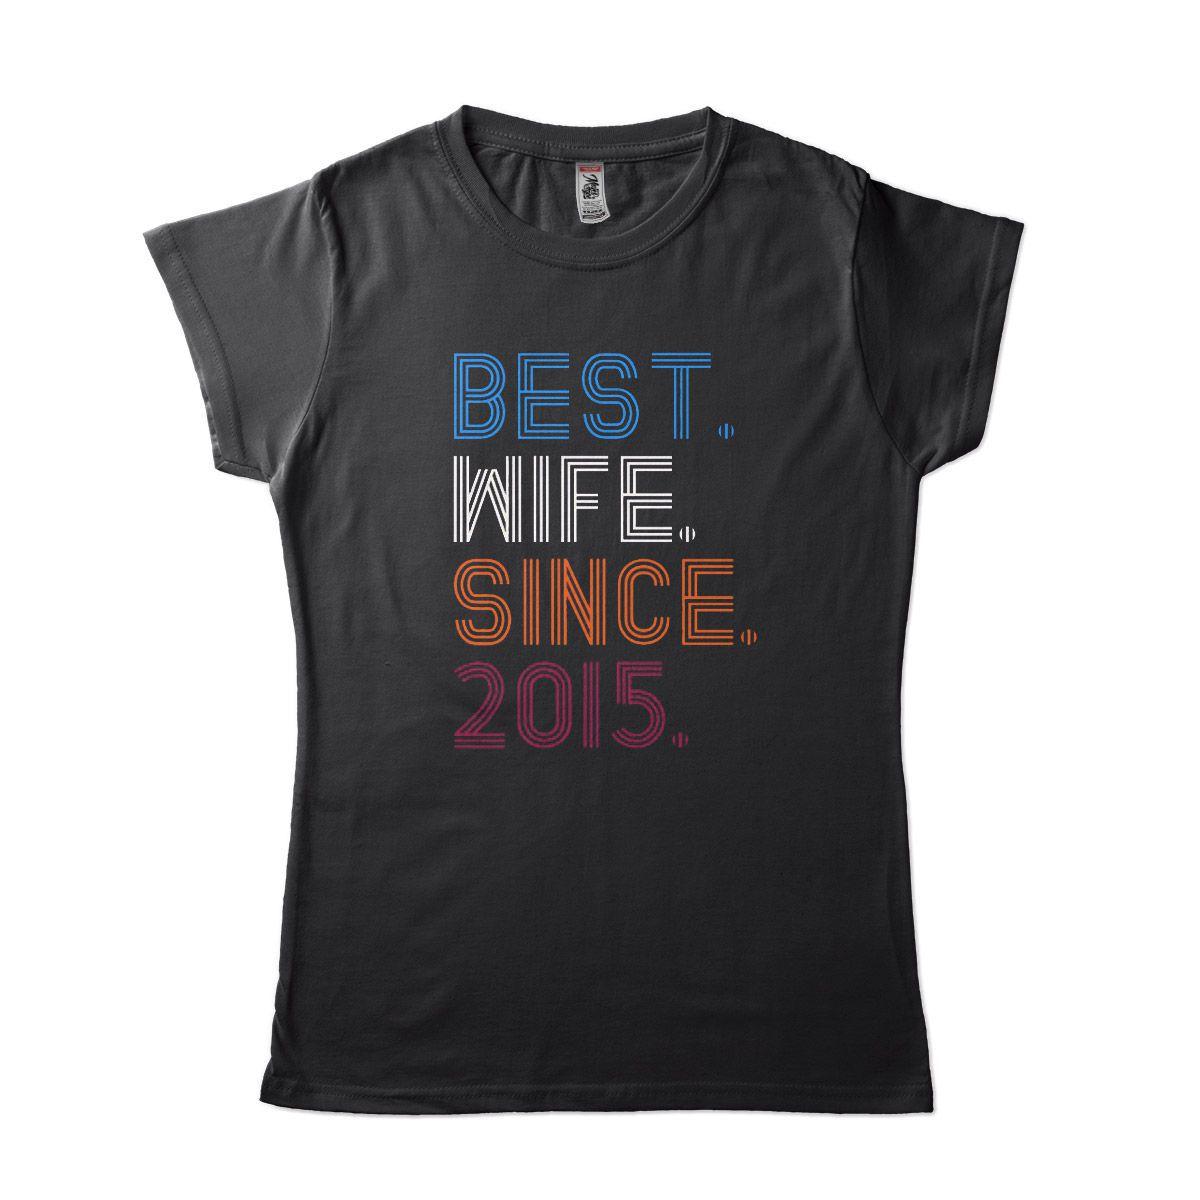 camisas para marido e esposa ideia de presente